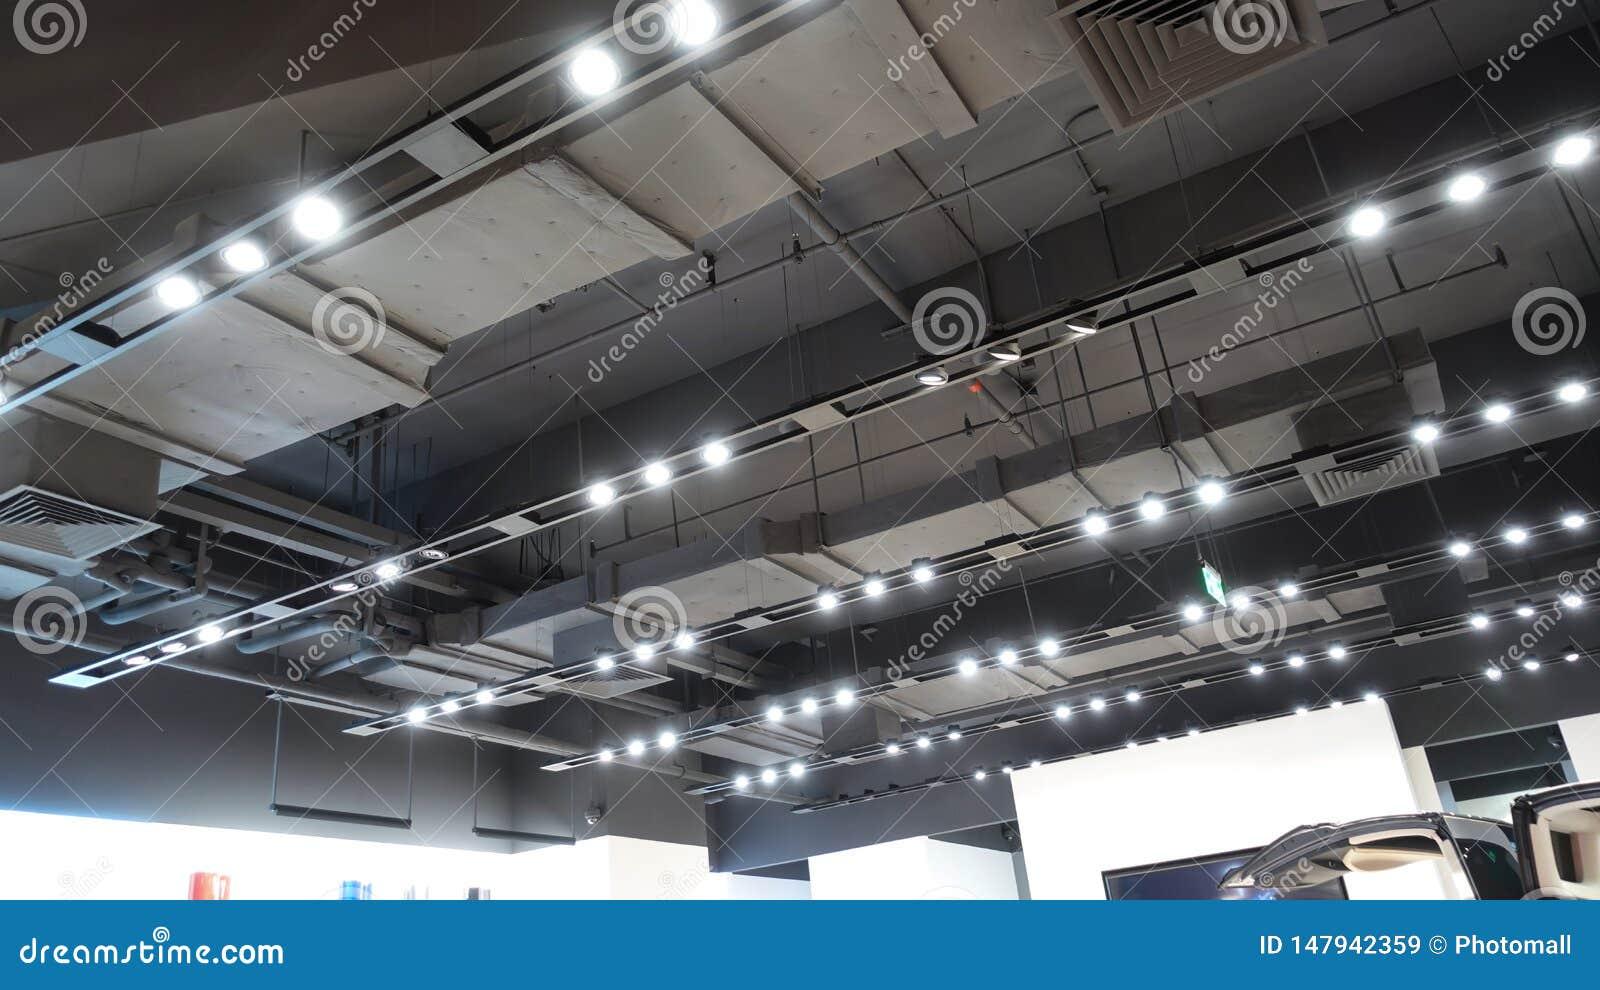 Led light on shop ceiling in modern commercial building